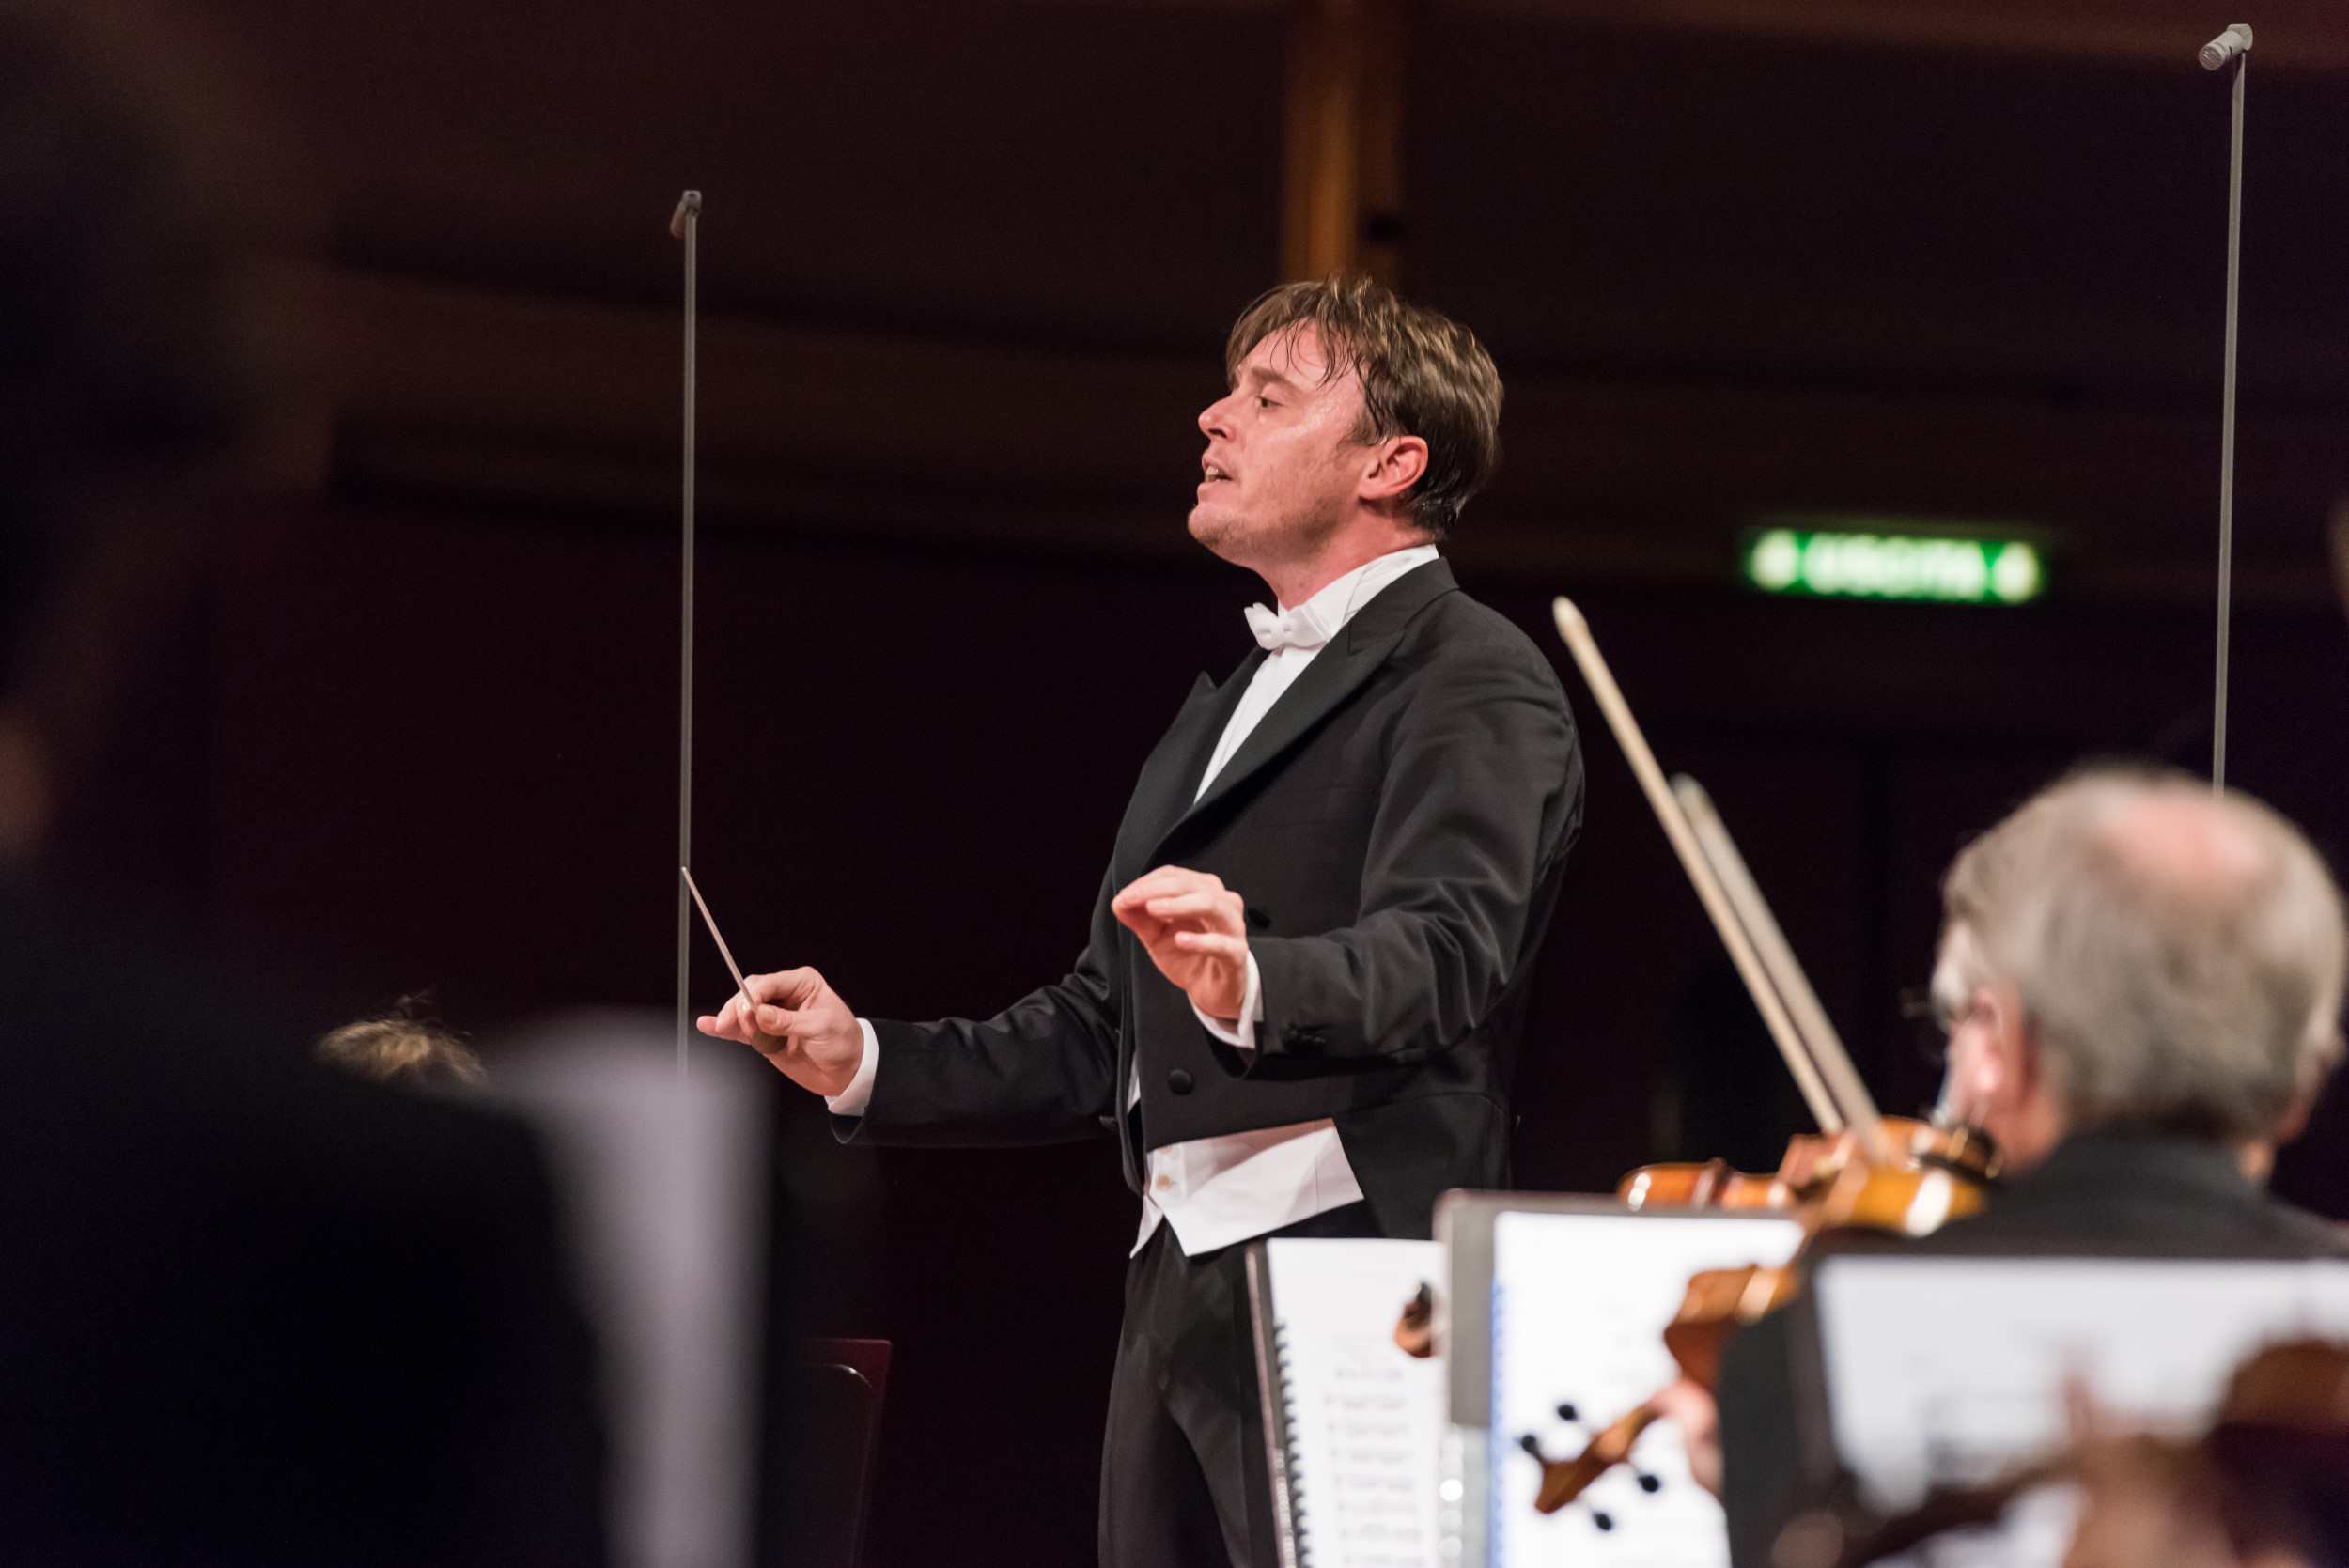 Mariotti_Orchestra-Rai_piùluce®2020-N3-39.jpg